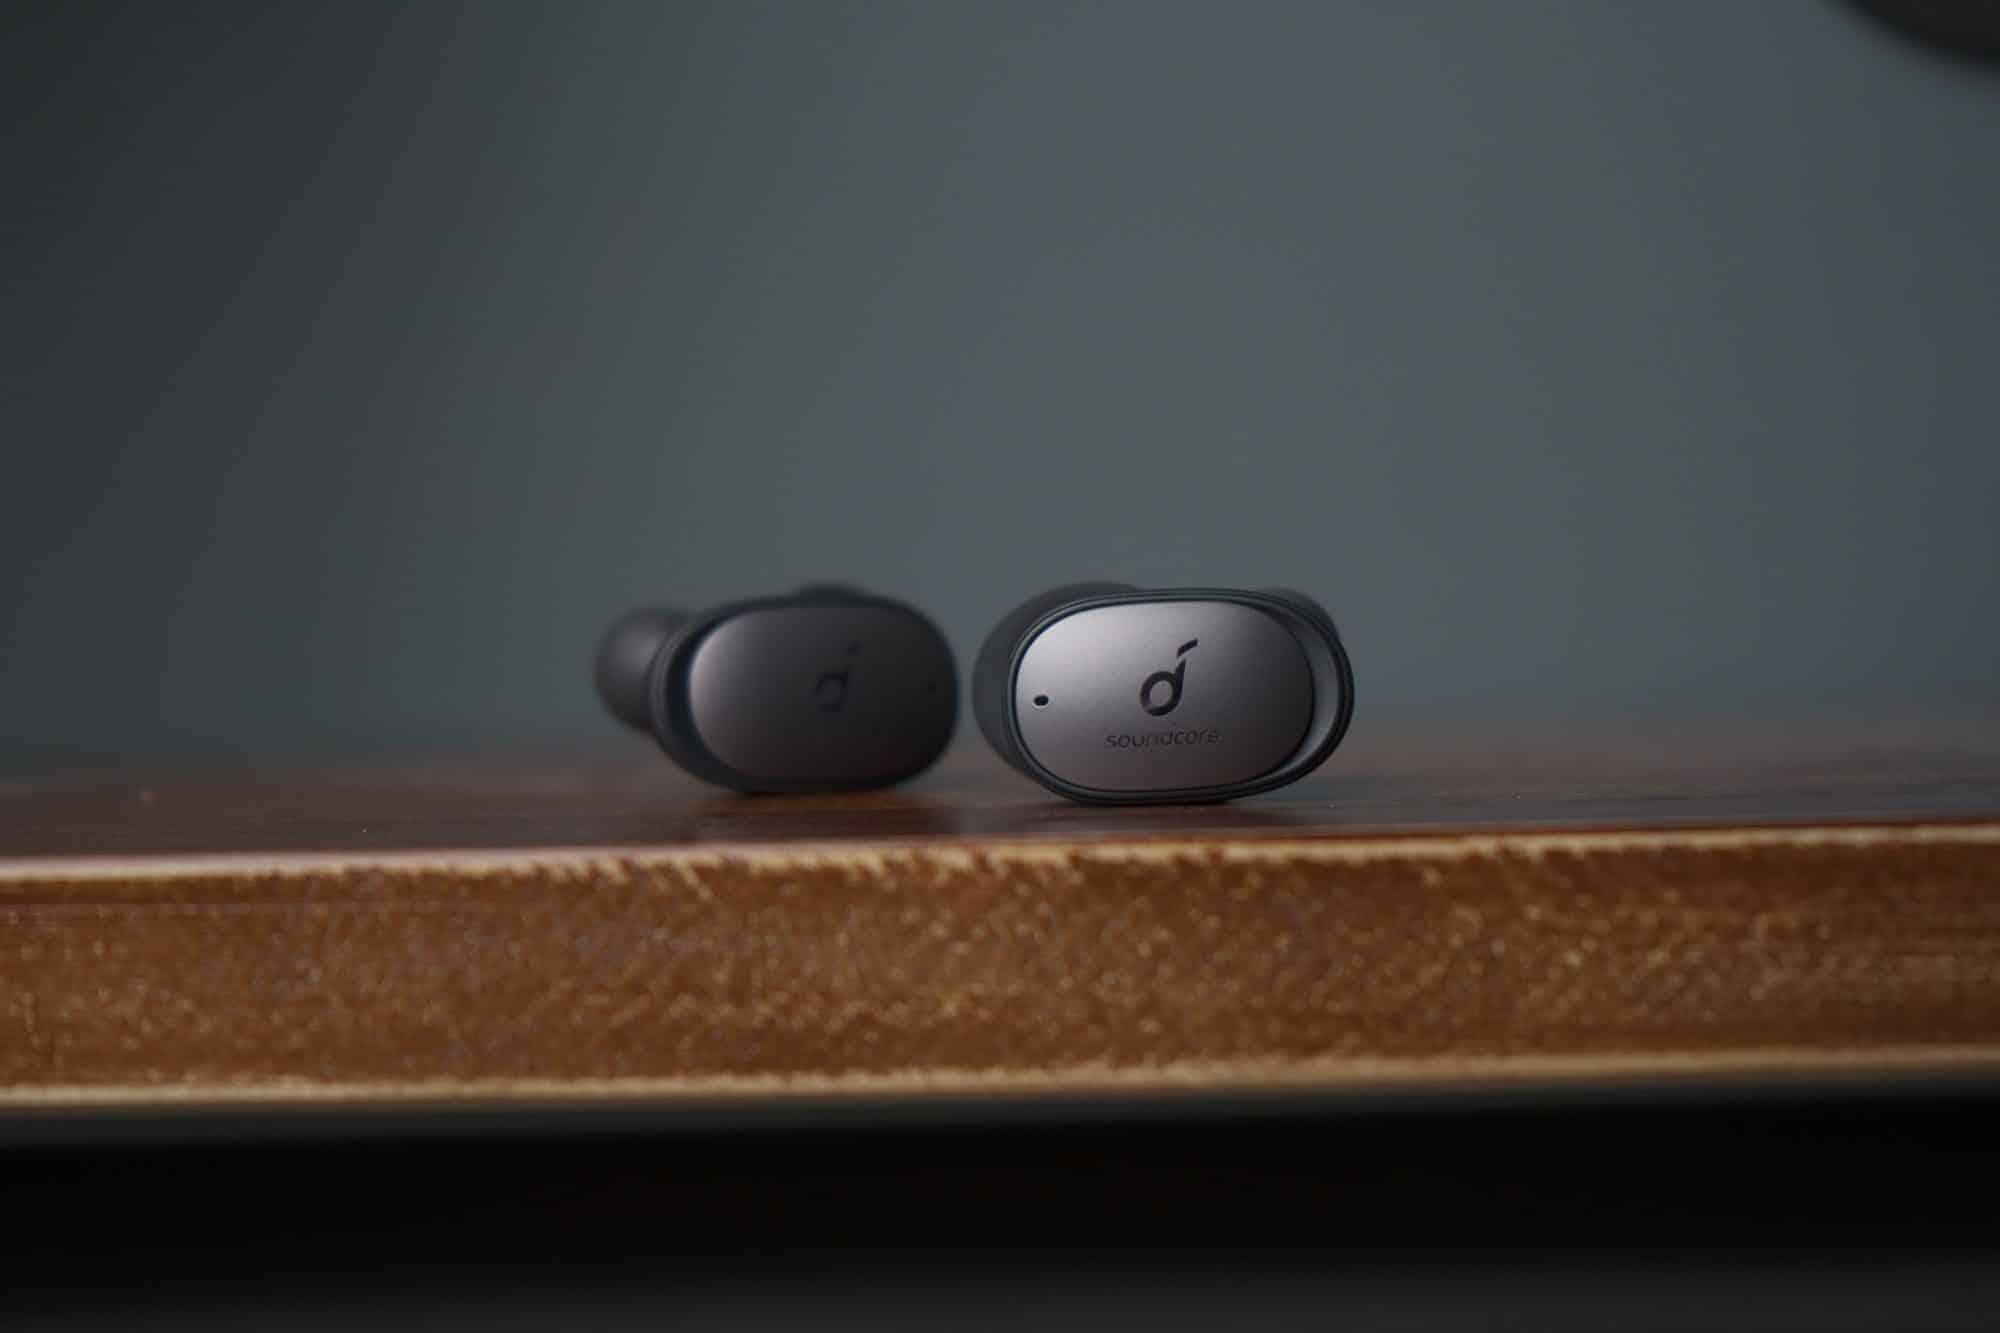 PTT鄉民推薦二款真無線藍牙耳機!Anker Soundcore Liberty 2 Pro比較NUARL N6 Pro-TechTeller (科技說)